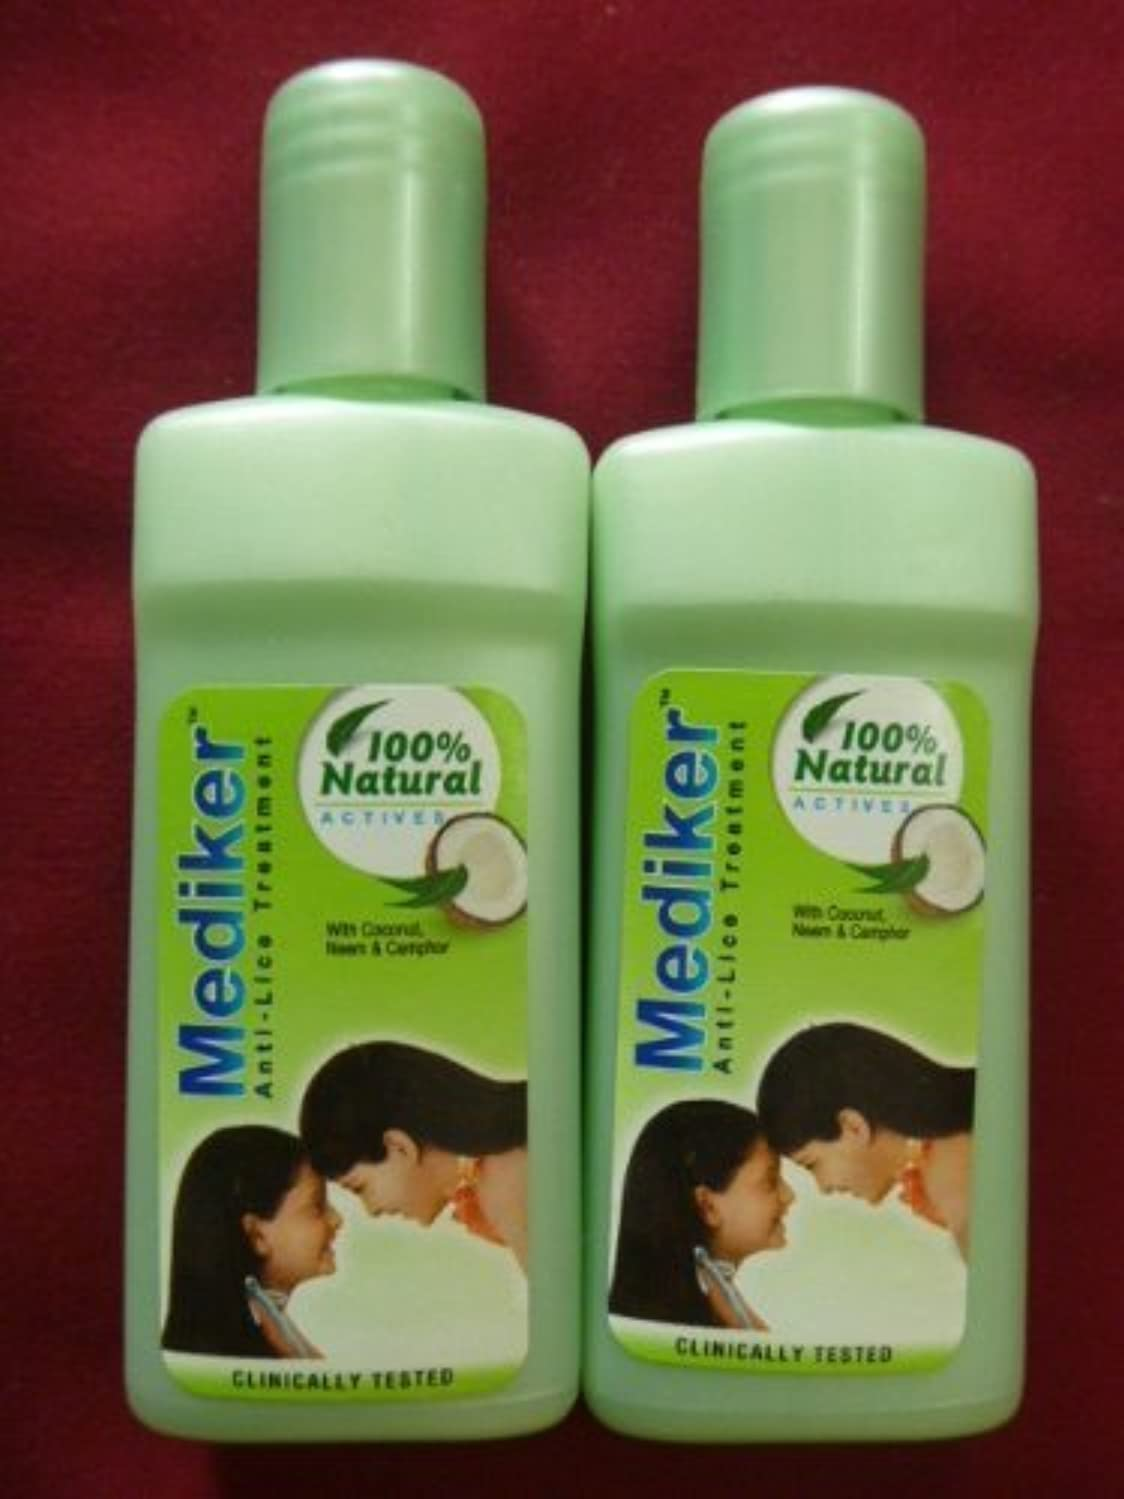 感度経度不承認2 X Mediker Anti Lice Remover Treatment Head Shampoo 100% Lice Remove 50ml X 2 = 100ml by Mediker [並行輸入品]